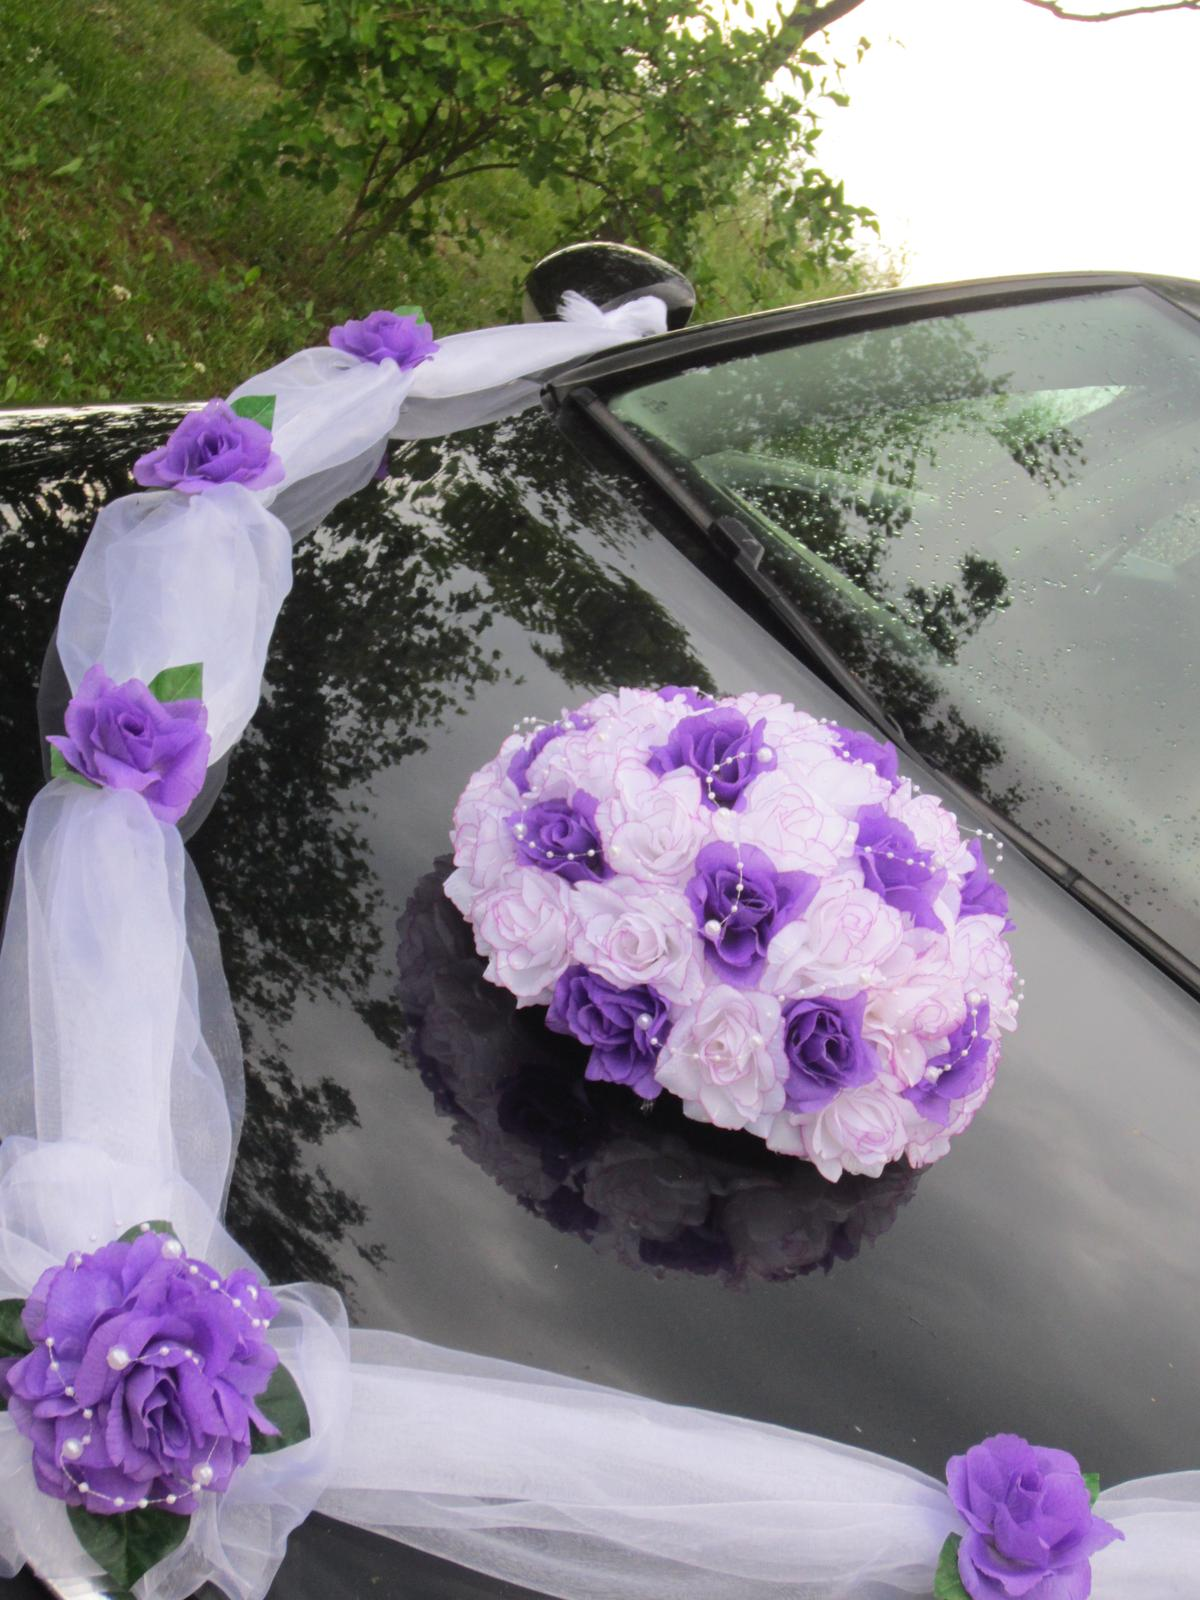 Svatebni Dekorace Vyzdoba Na Auto Trs Ruzi Buket 490 Kc